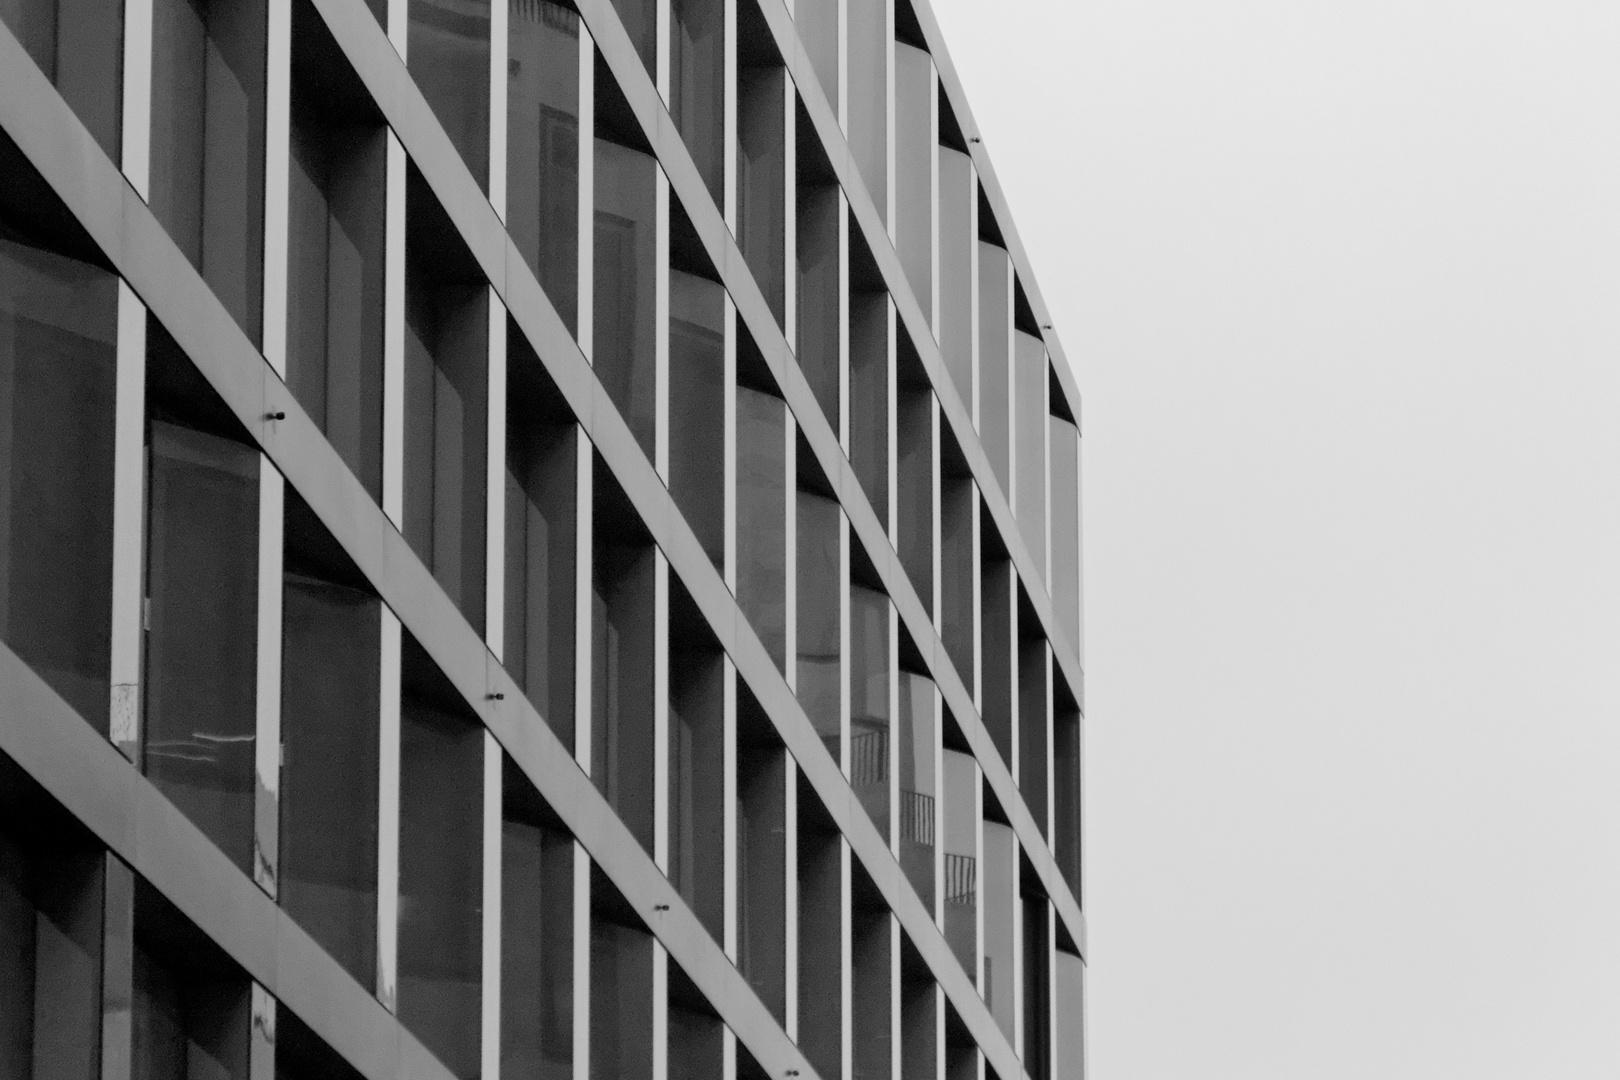 Fassade IV